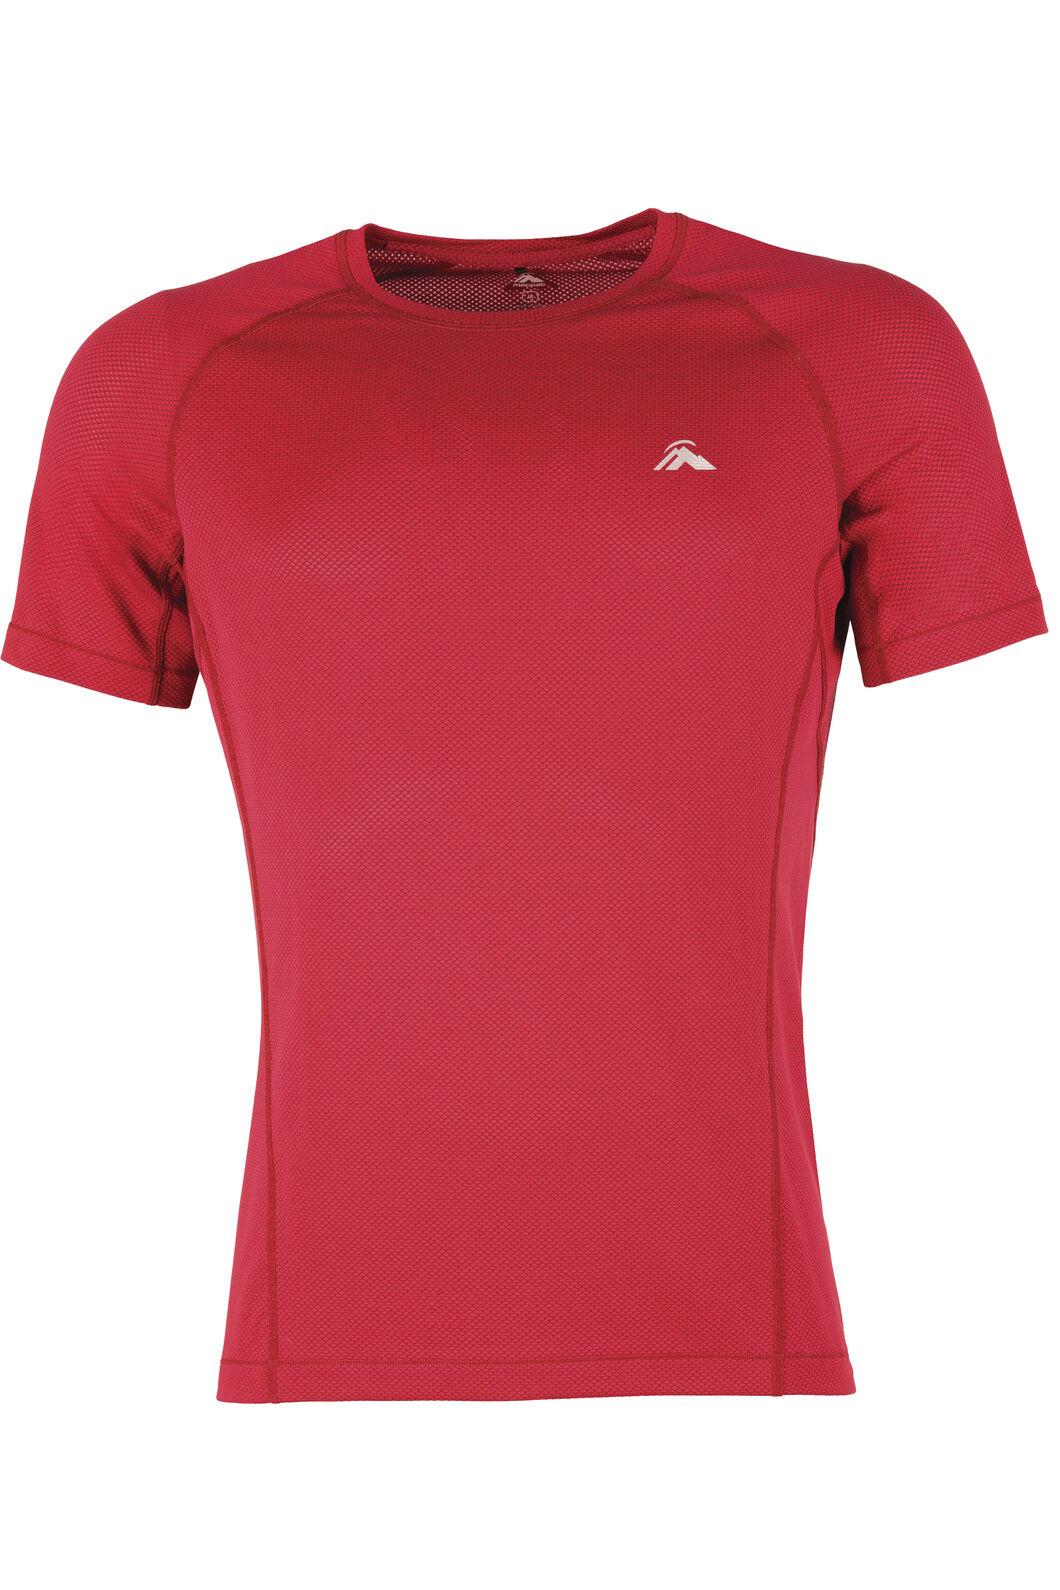 Macpac Litespeed Polartec® Delta™ Short Sleeve Shirt - Men's, Flame Scarlet, hi-res